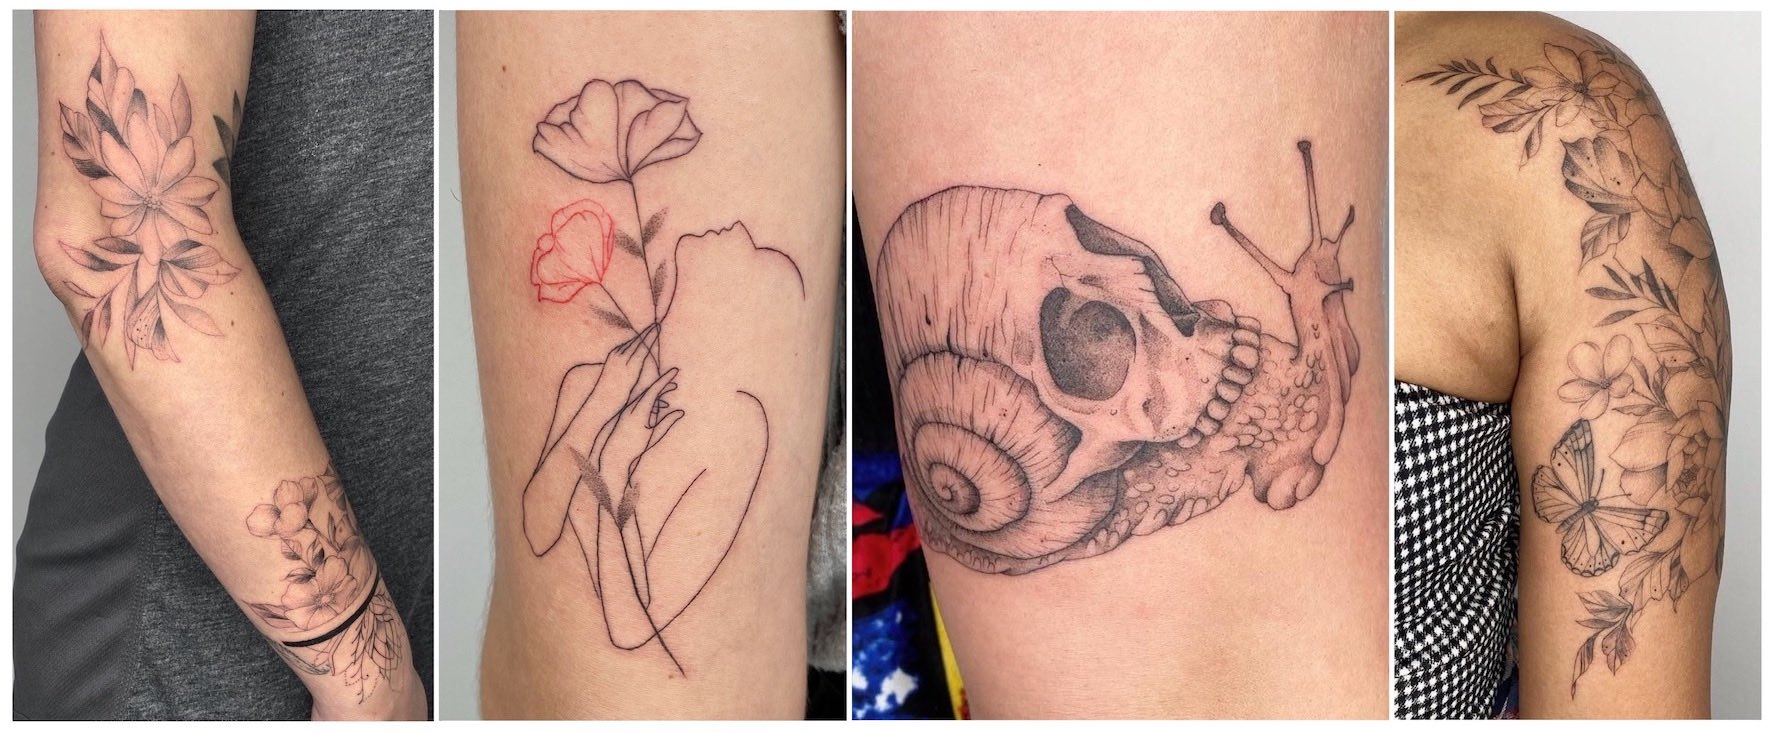 Tattoos done by Alyssa van der Merwe